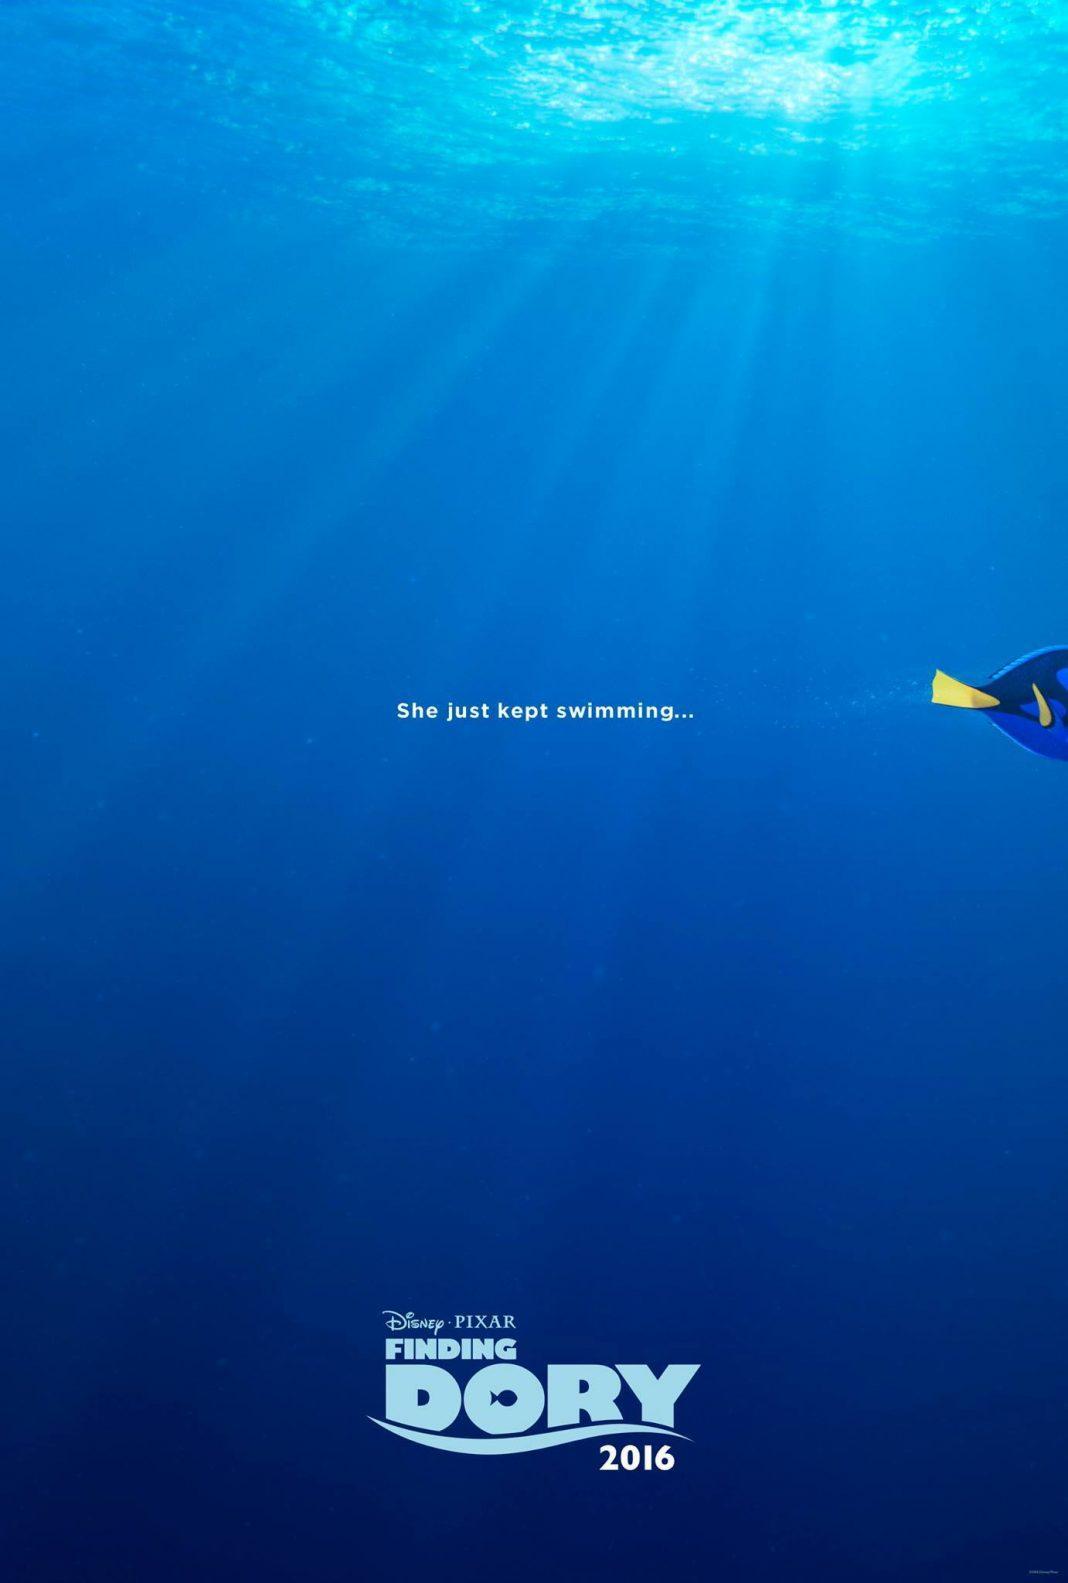 pixar disney affiche poster monde de dory finding